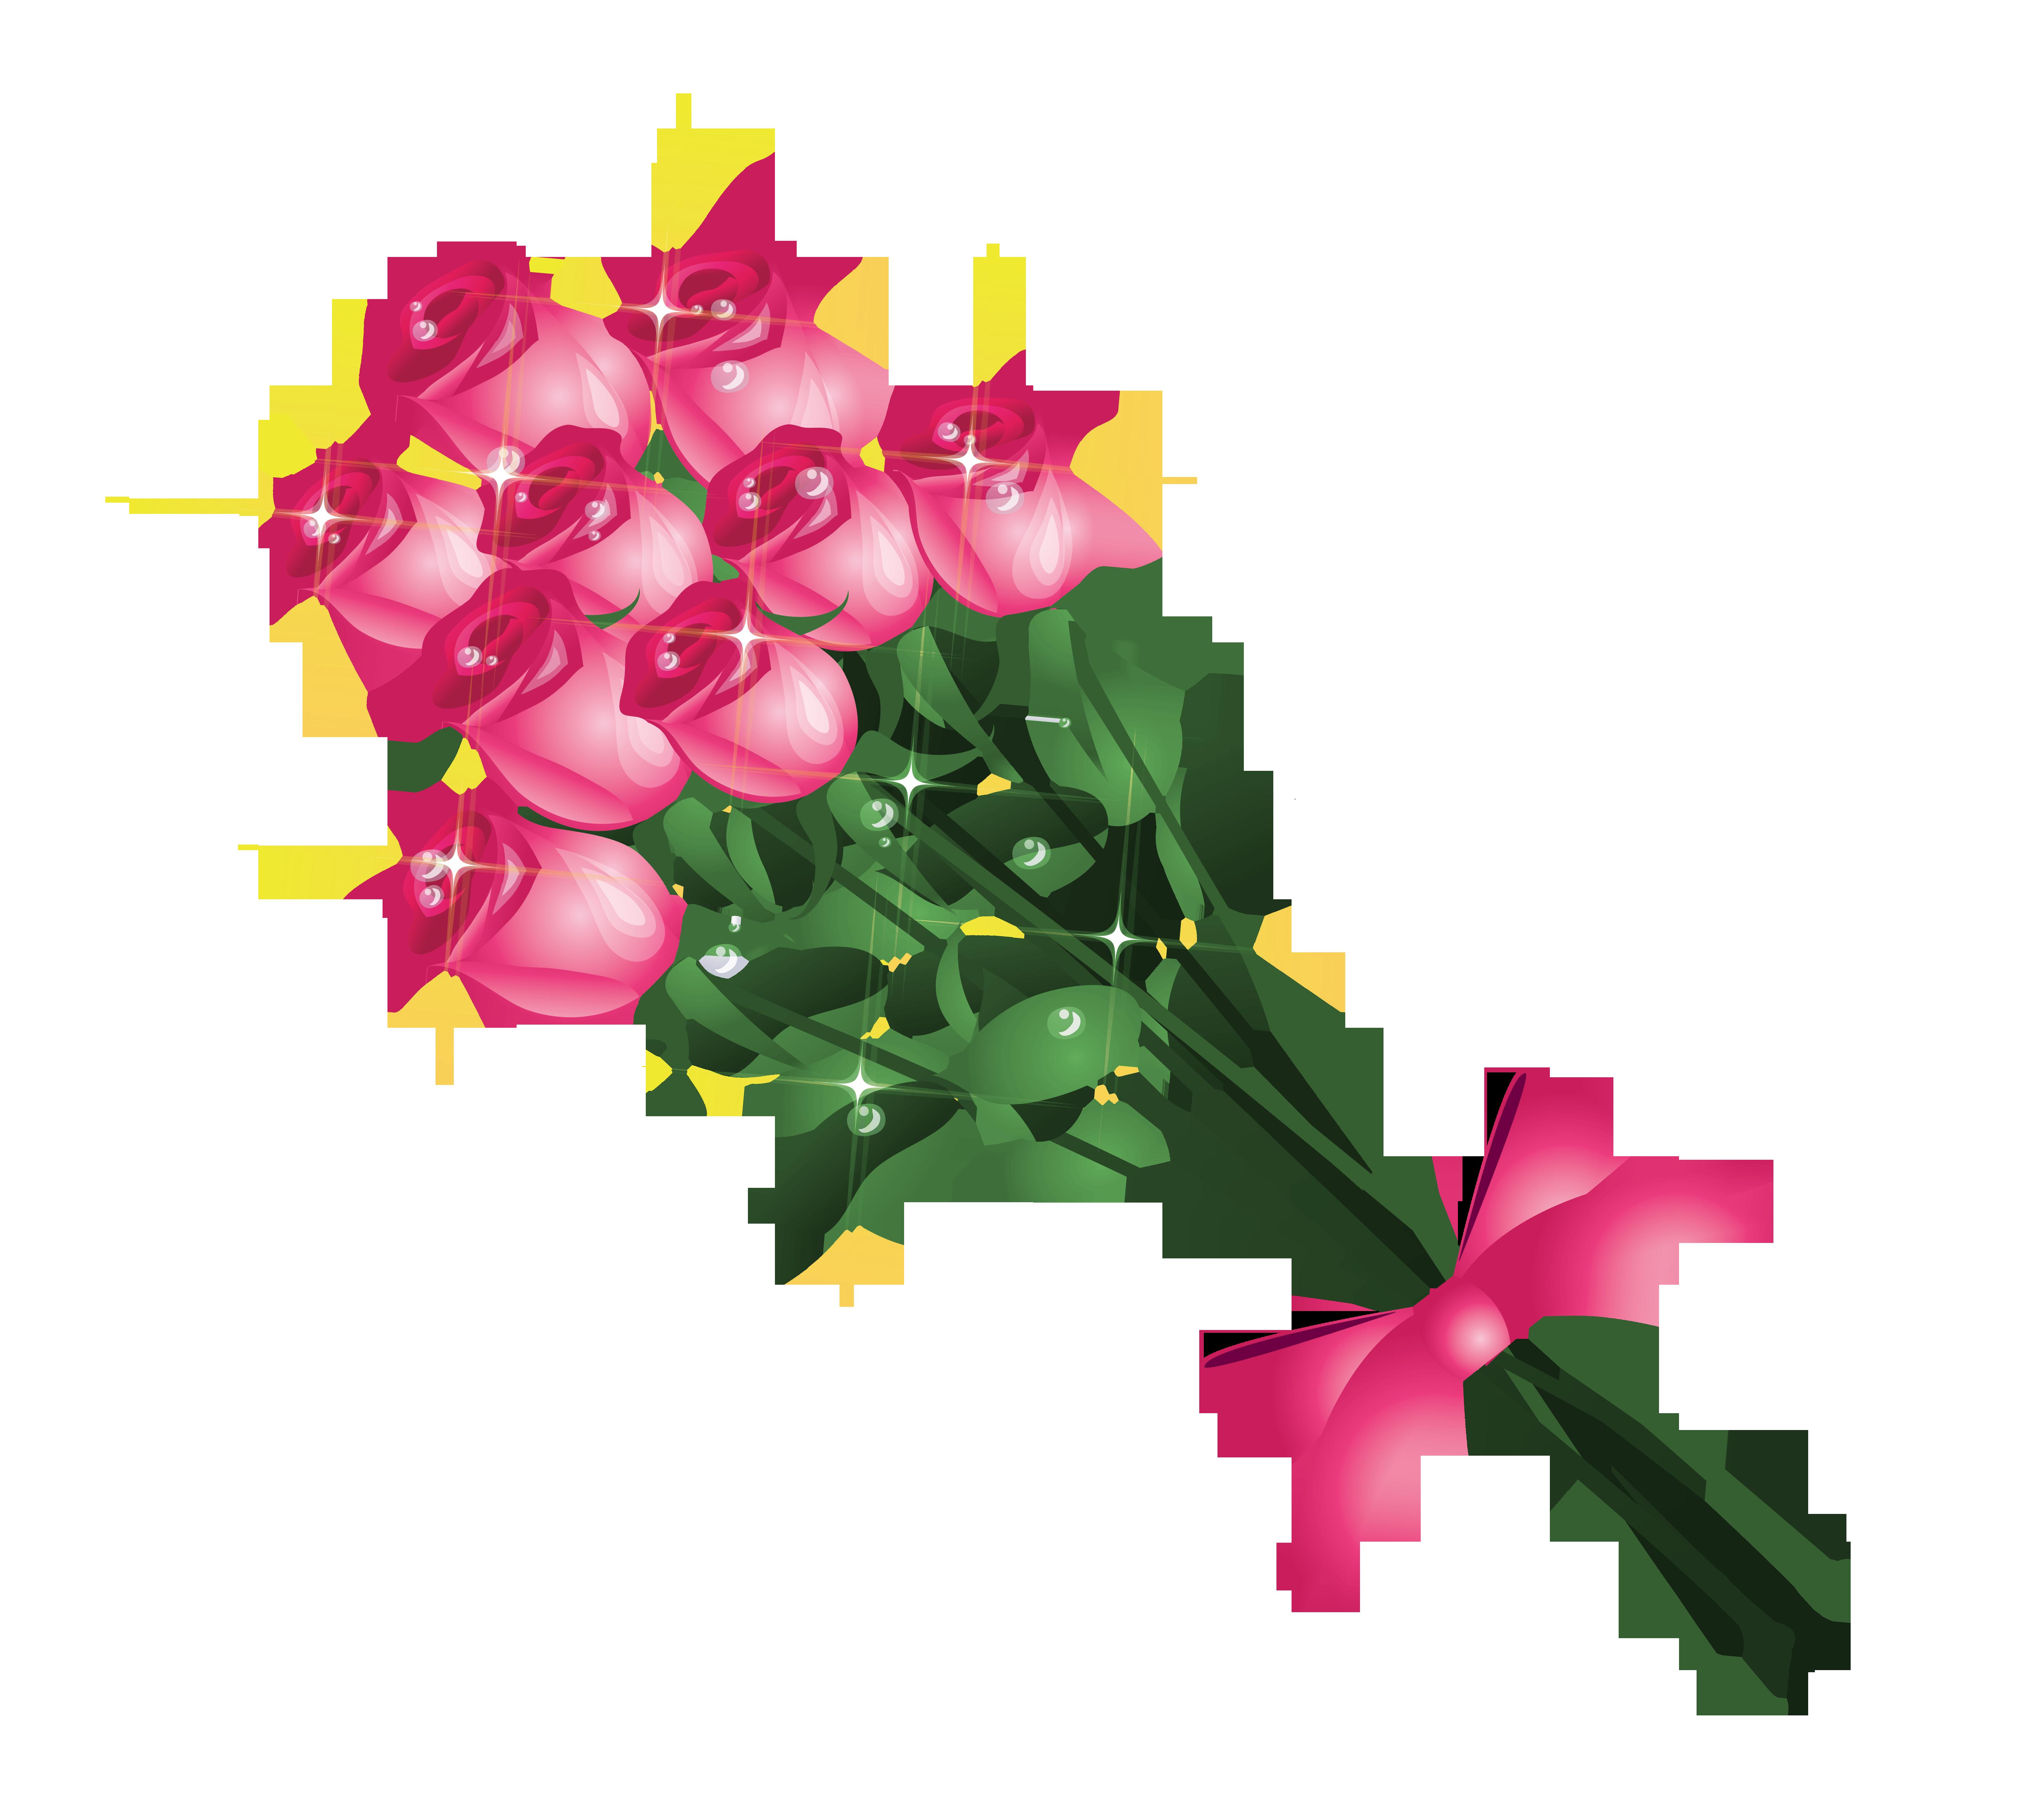 Transparent Pink Roses Bouquet PNG Clipart Picture.